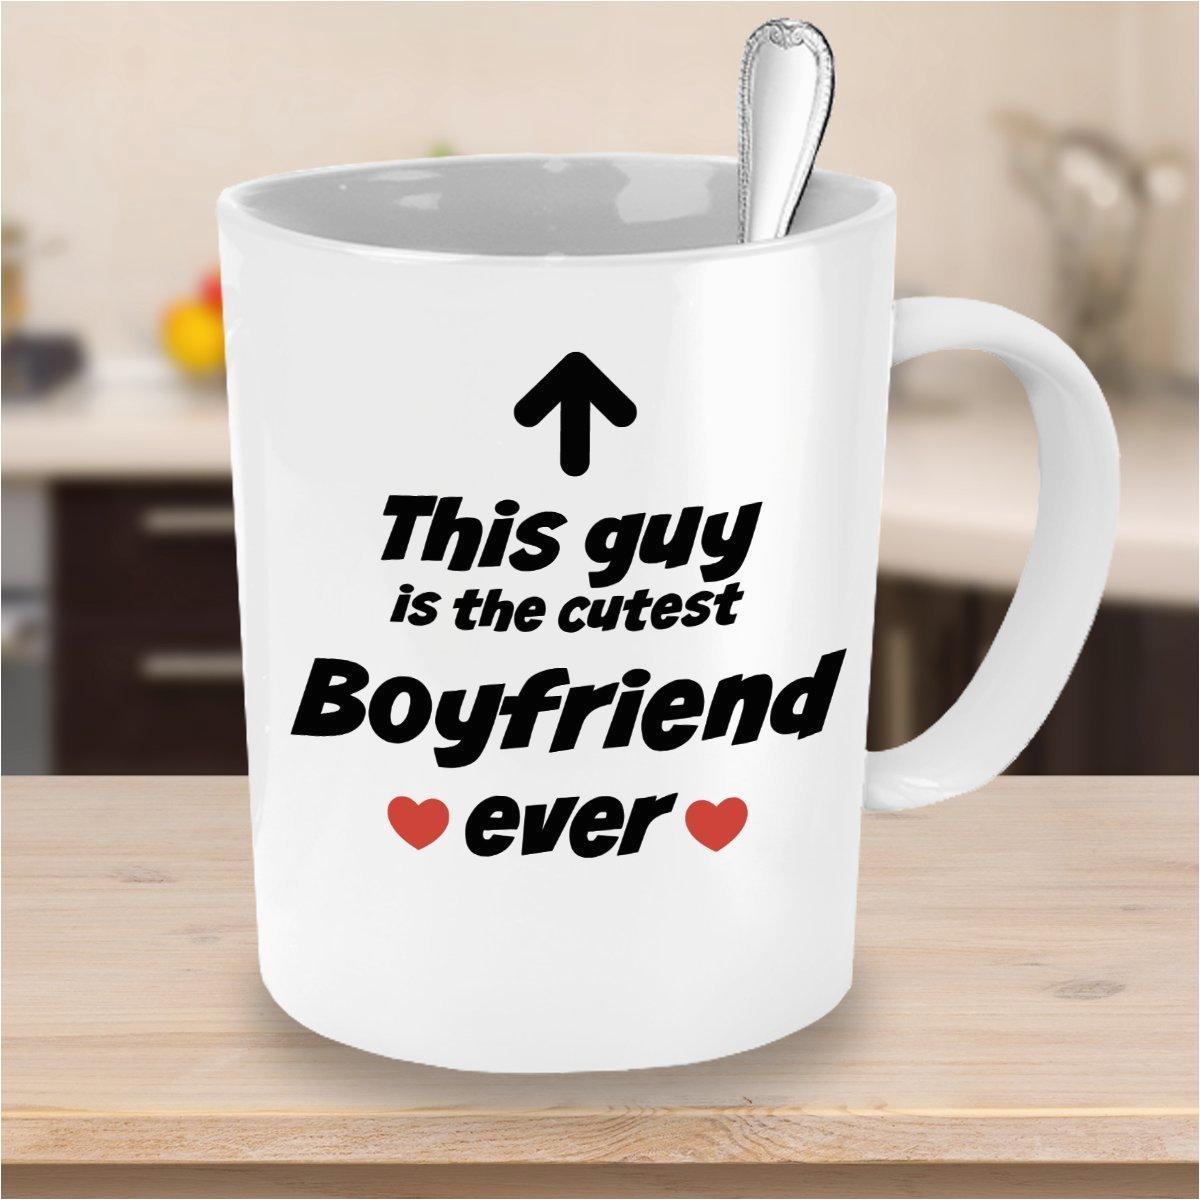 boyfriend mug cutest boyfriend ever funny coffee mug unique christmas present idea for men best family cup and birthday gag gift for brothers dad kids son husband 1008579087